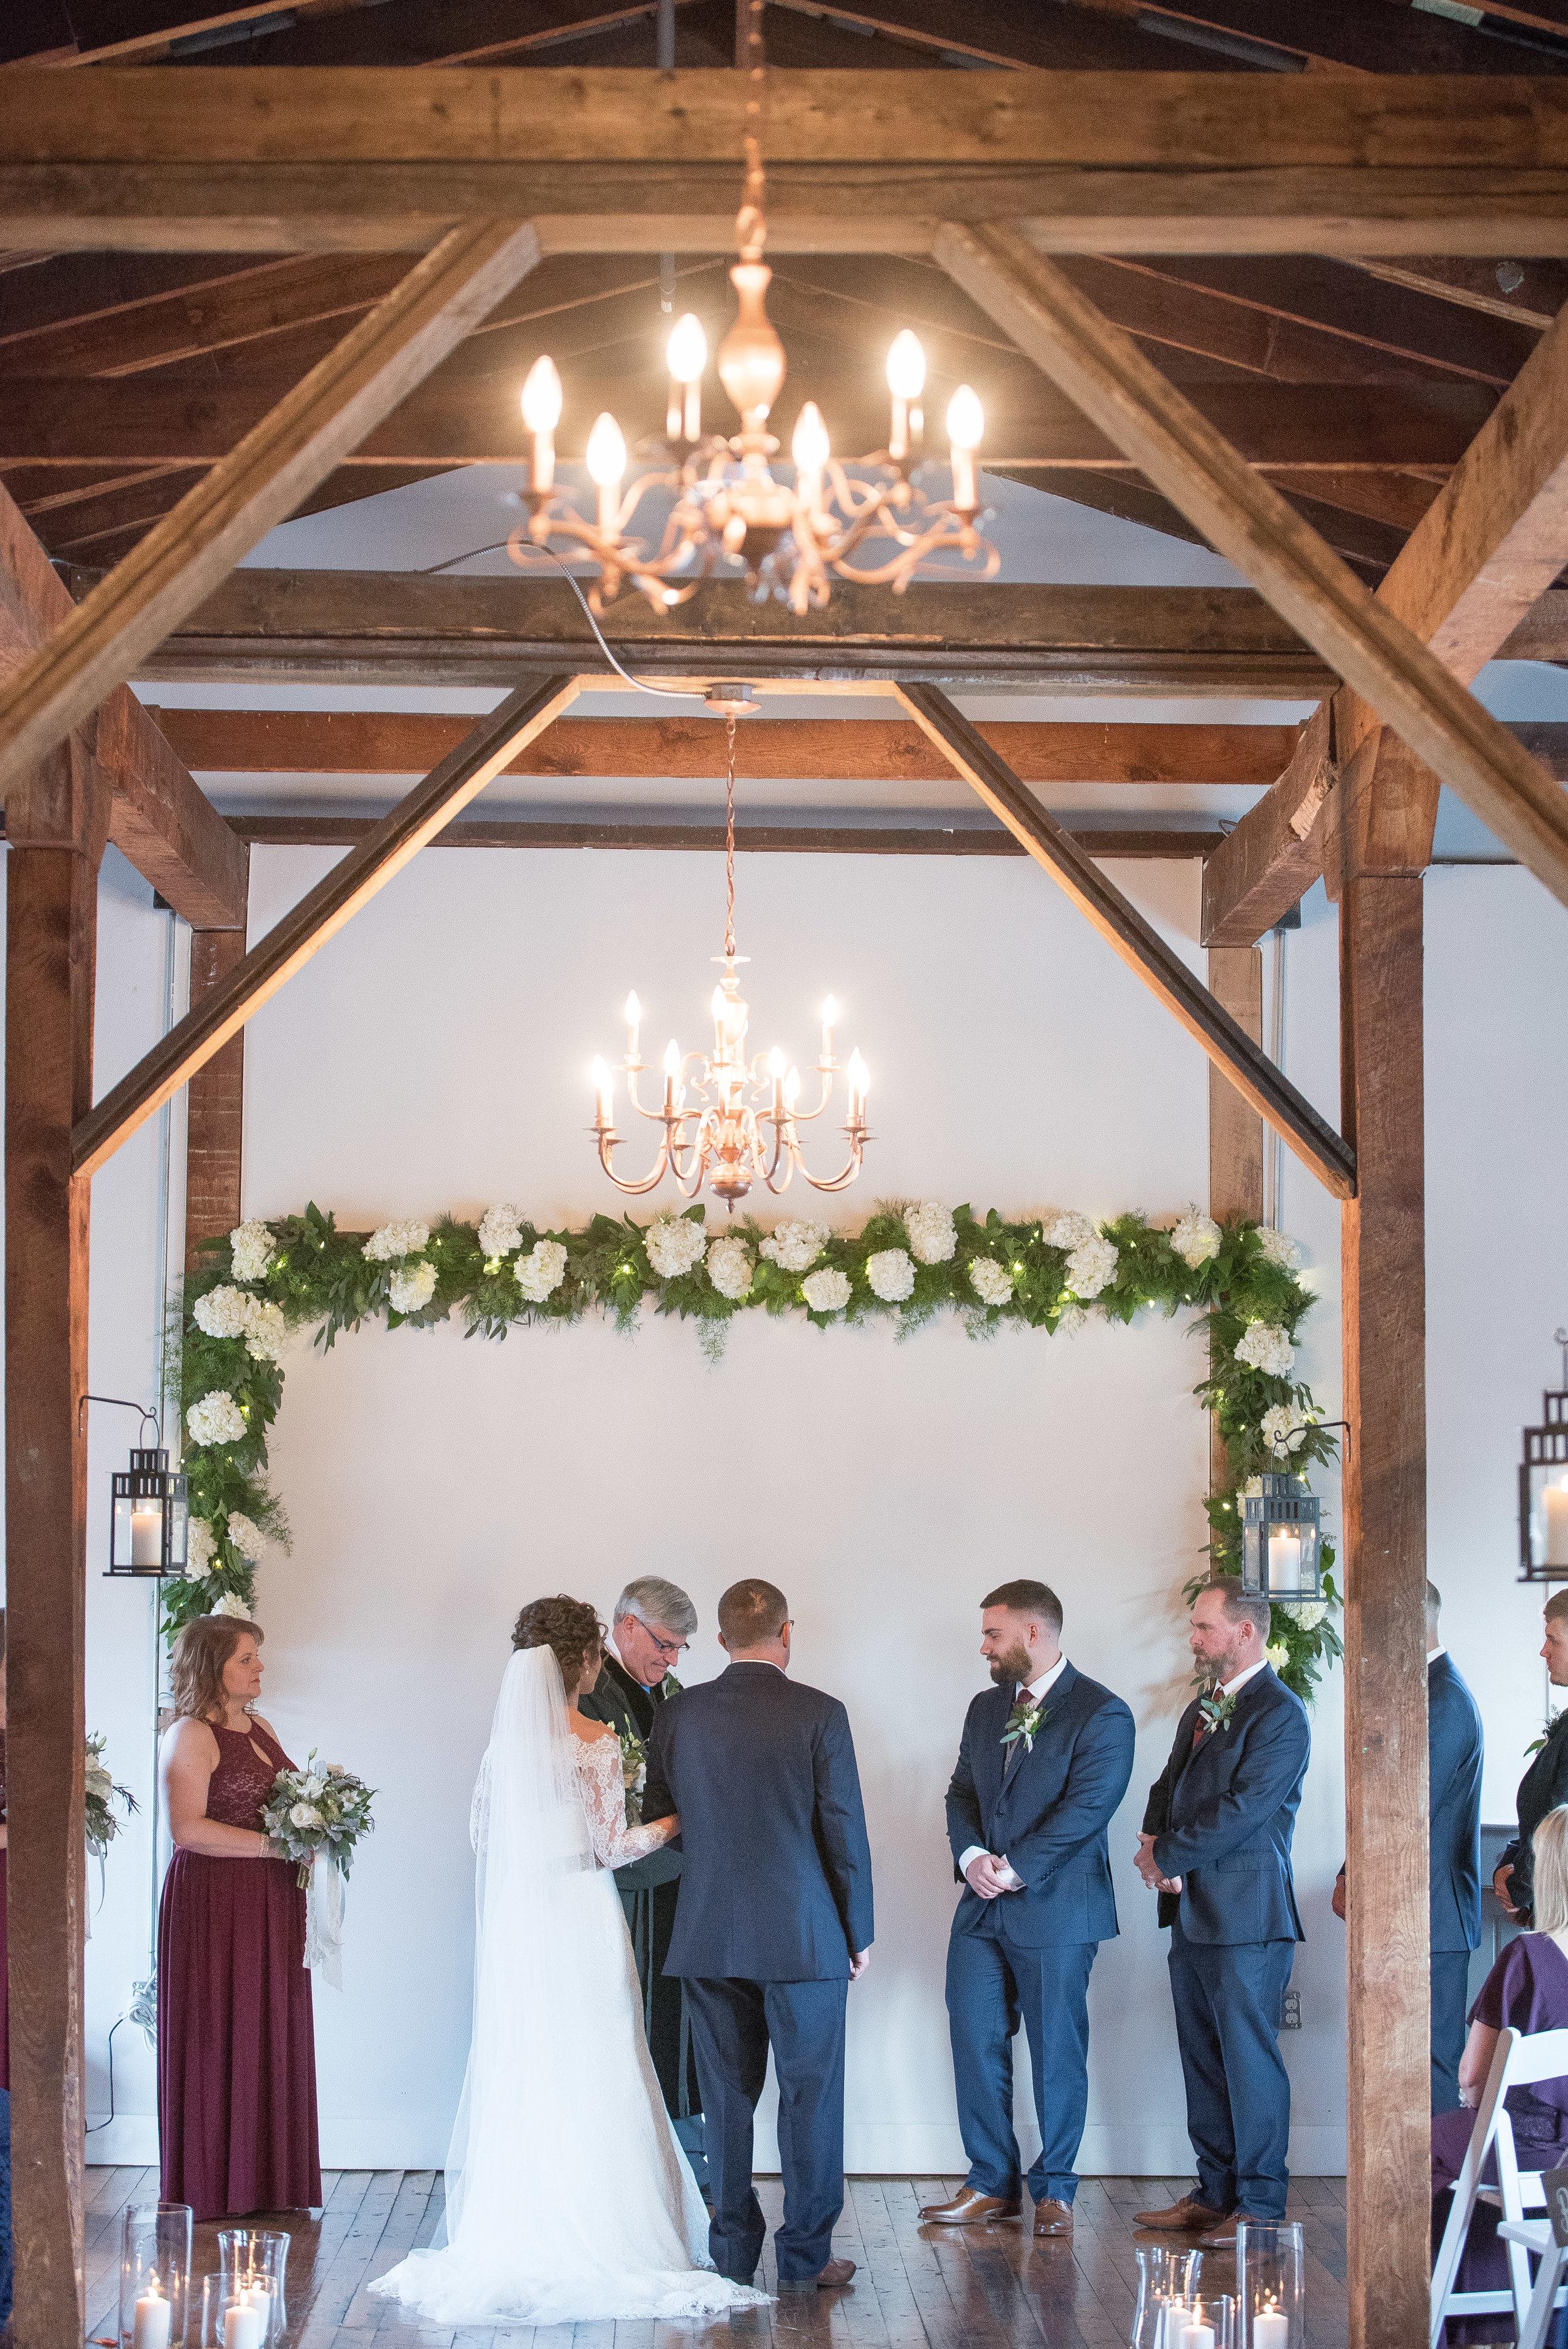 The Roller Mill Events - Winston Salem Weddings - NC Weddings - High Point NC Weddings - Winston Salem Venue - Yasmin Leonard Photography-31.jpg